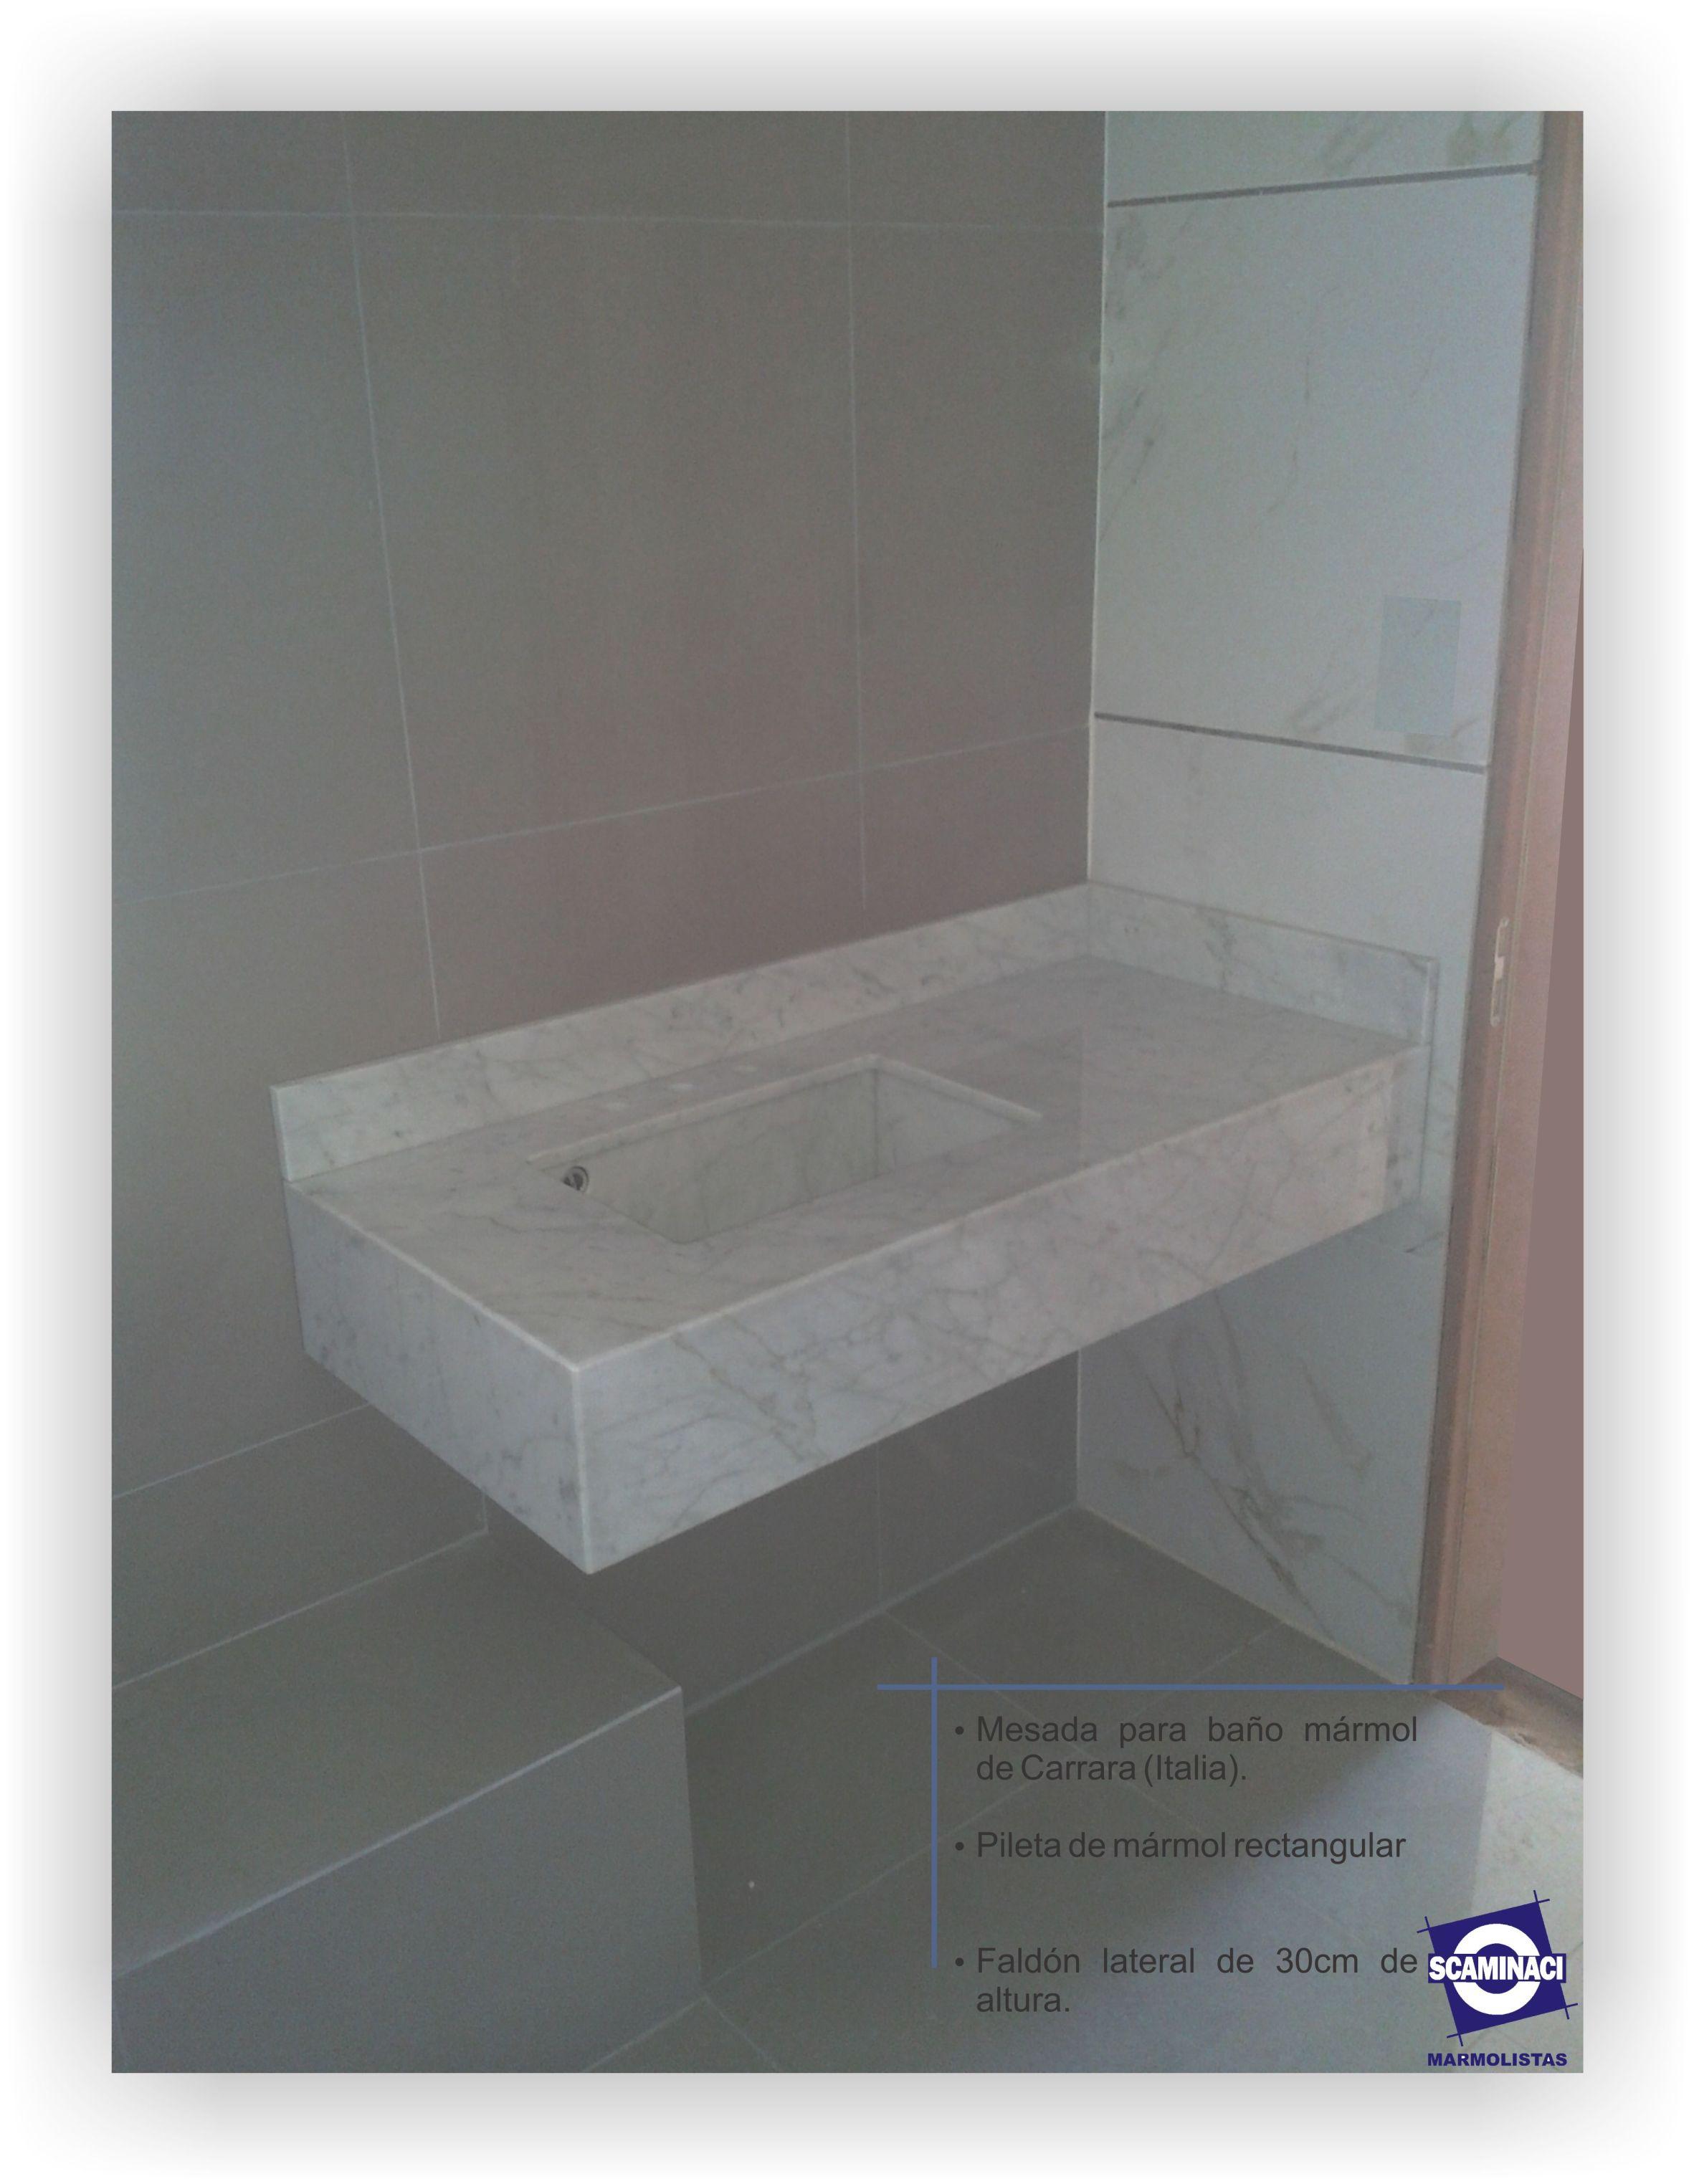 Scaminaci marmolistas blog archive mesada para ba o en for Marmol de carrara limpieza